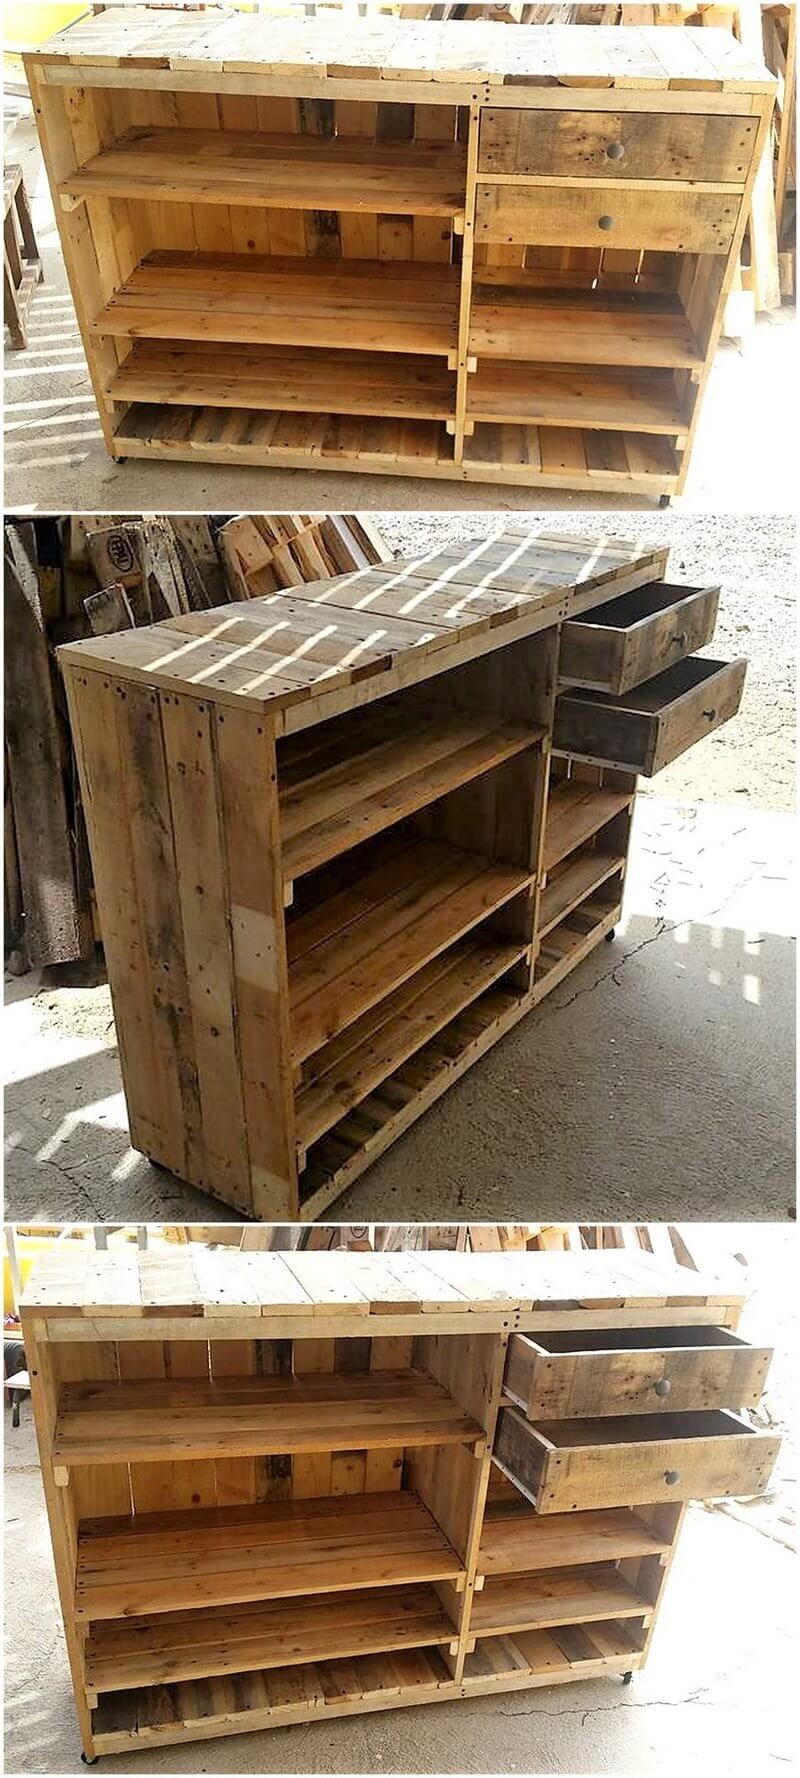 wooden pallet counter idea